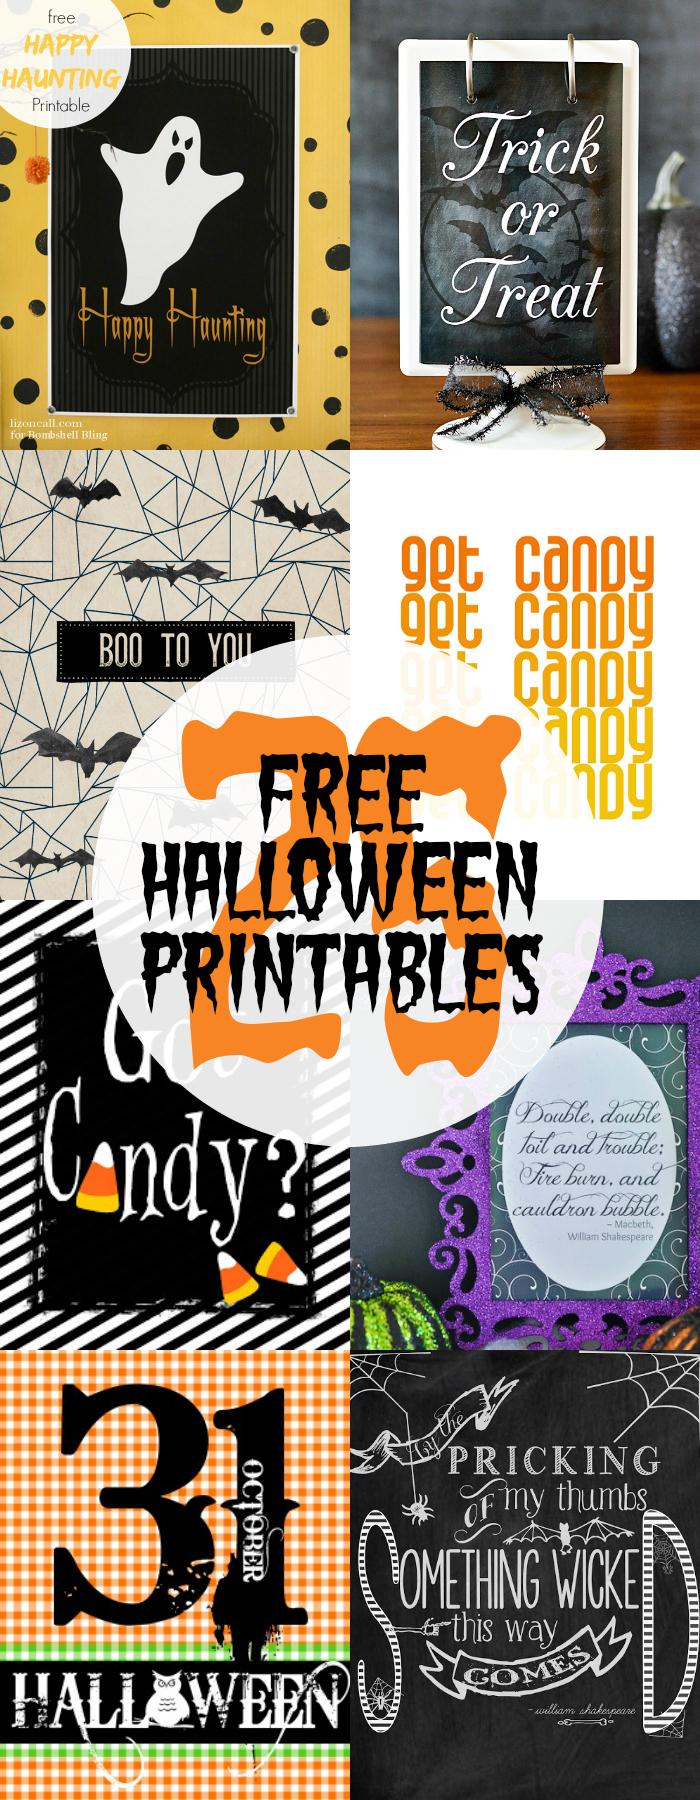 Halloween Printables pin collage